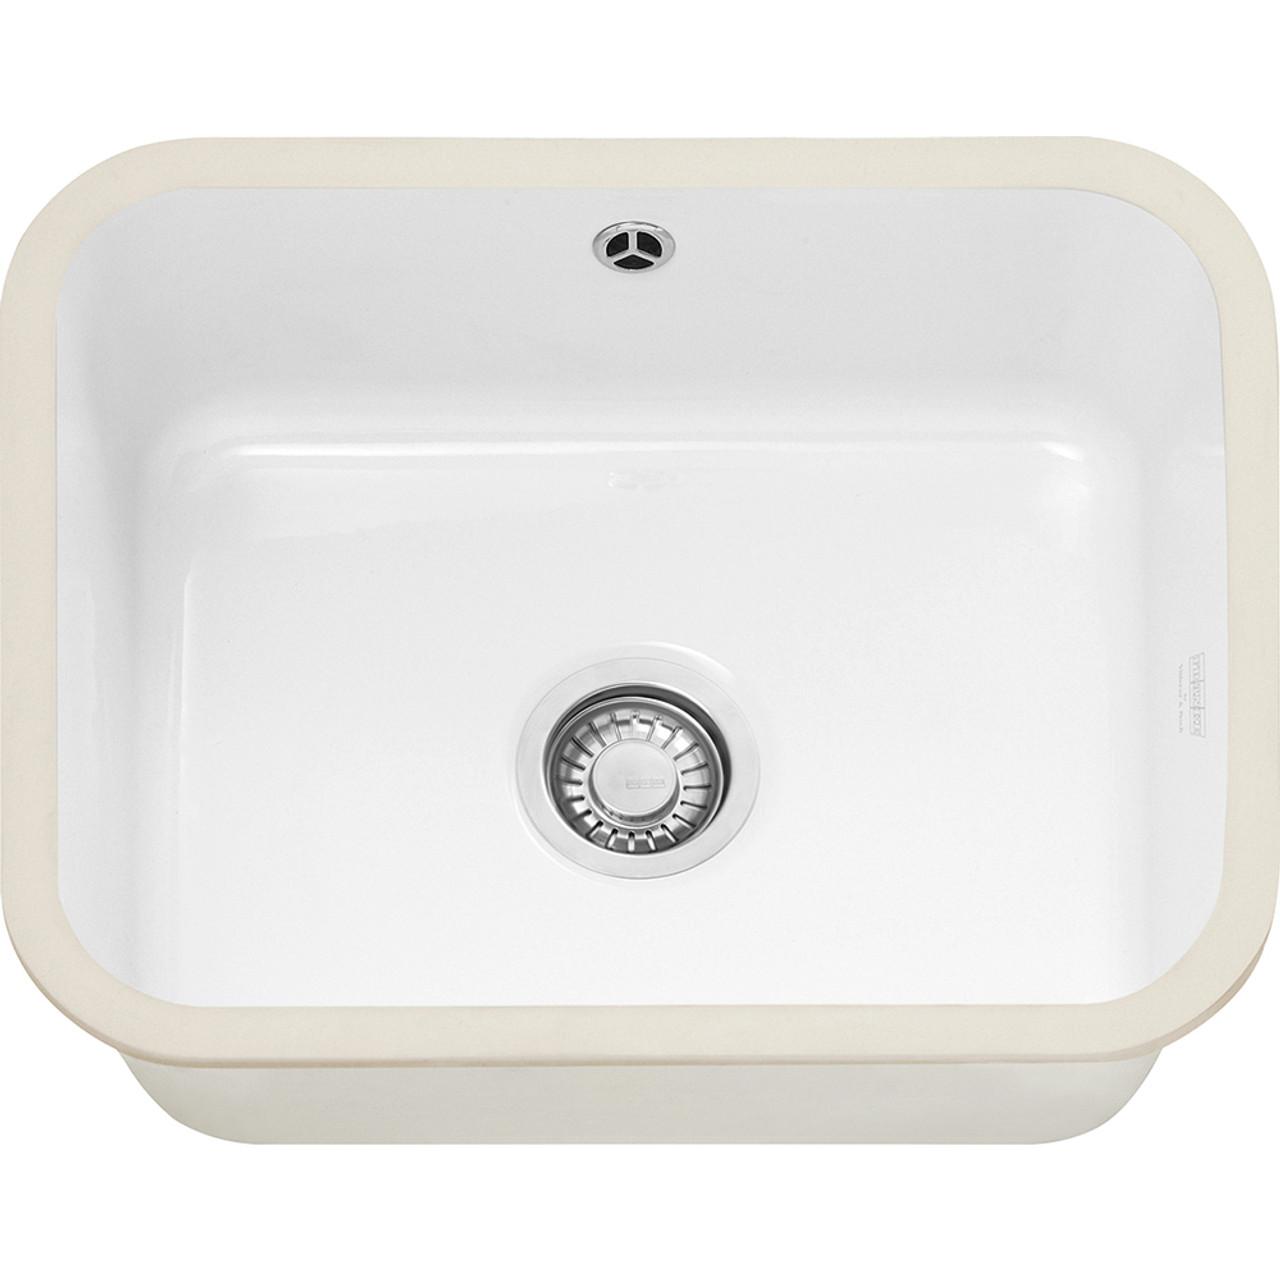 Franke VBK110 50 Ceramic White Kitchen Sink - Sinks